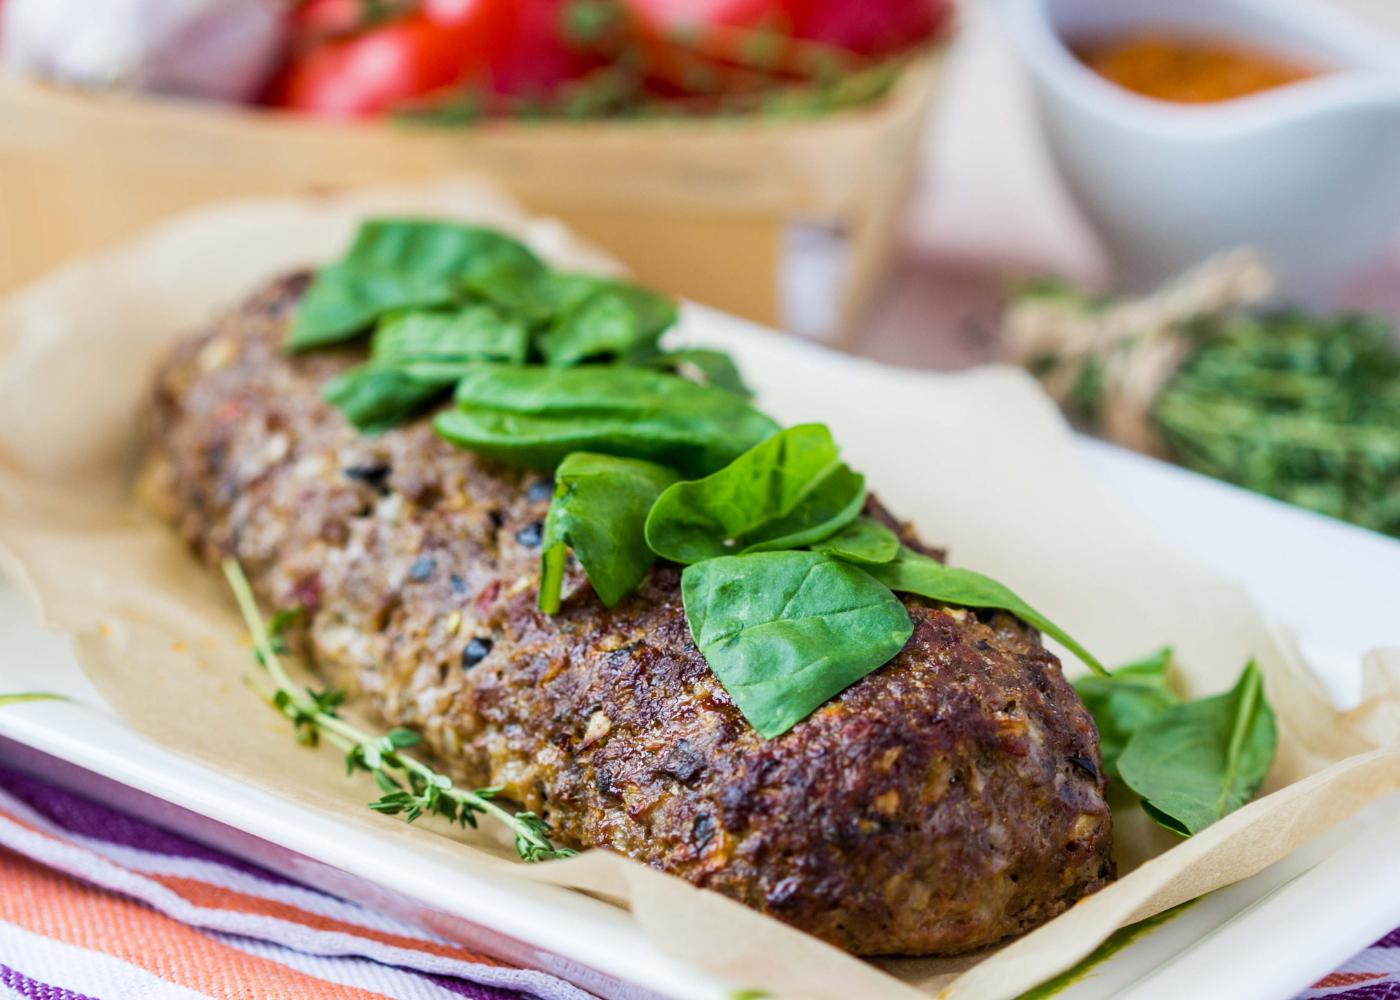 rolo de carne com espinafres e queijo